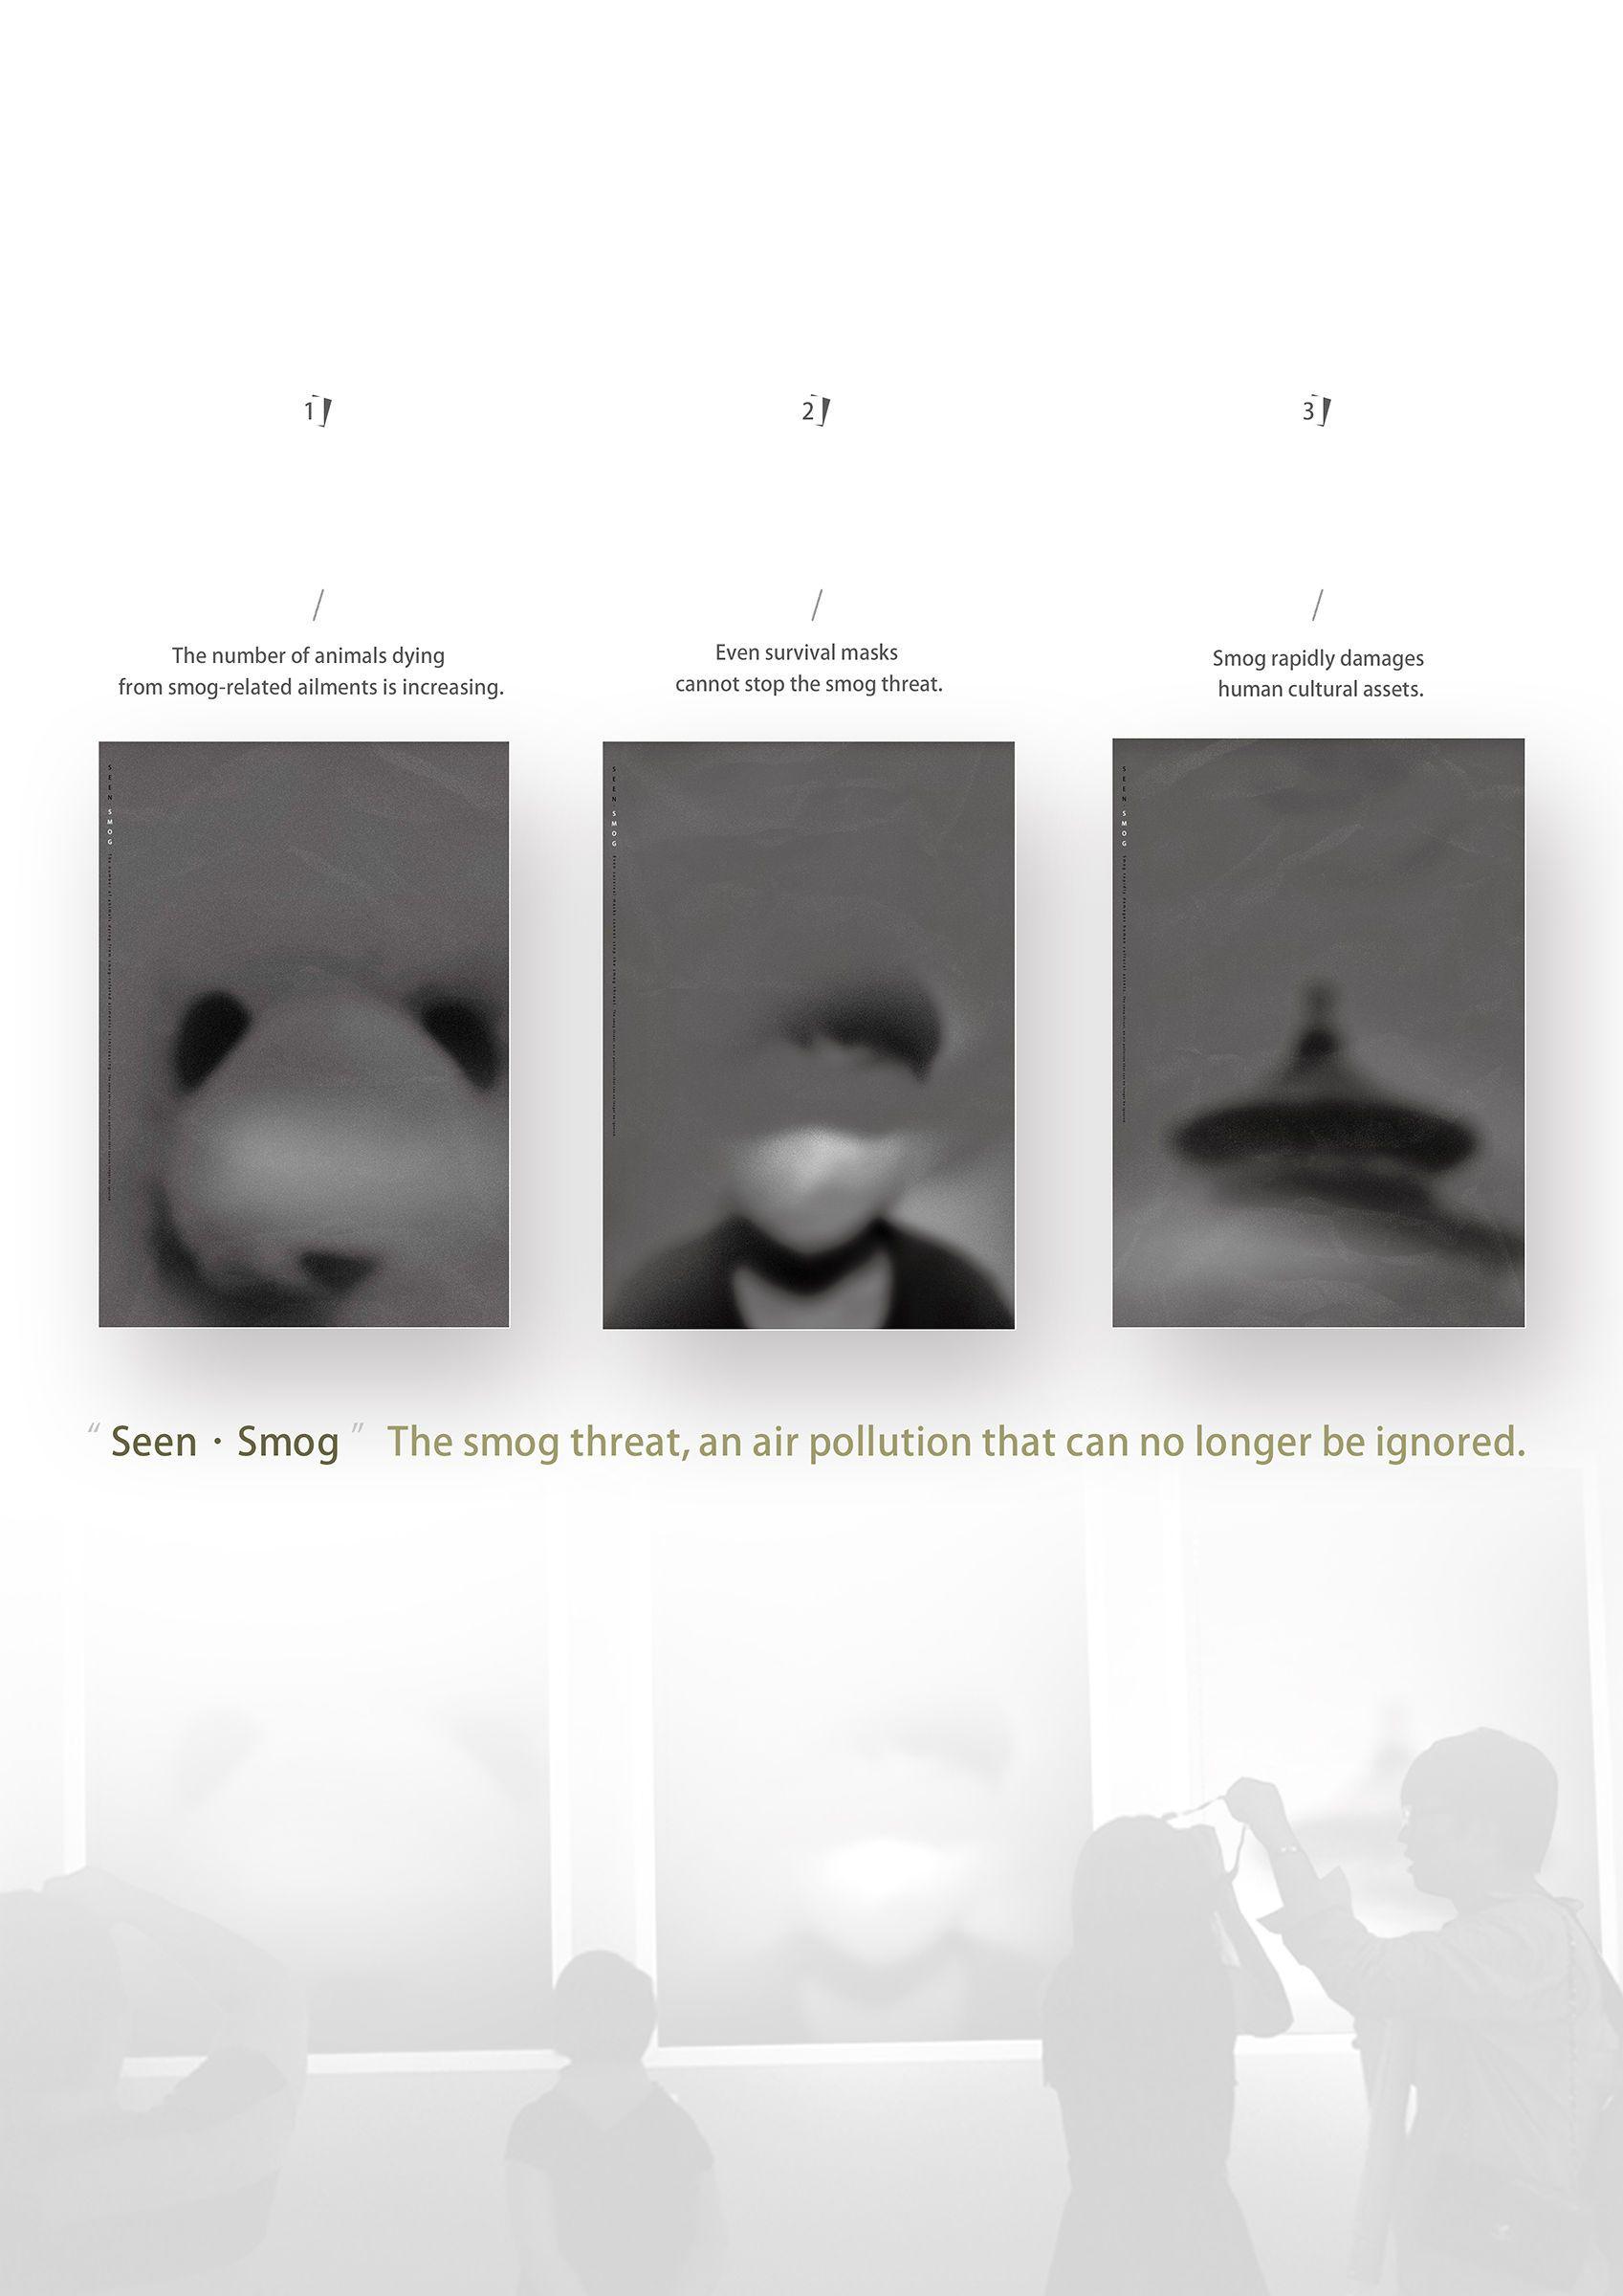 Poster design awards - Smog Air Environment Pollution Awareness Poster Design Award Winning Graphic Design